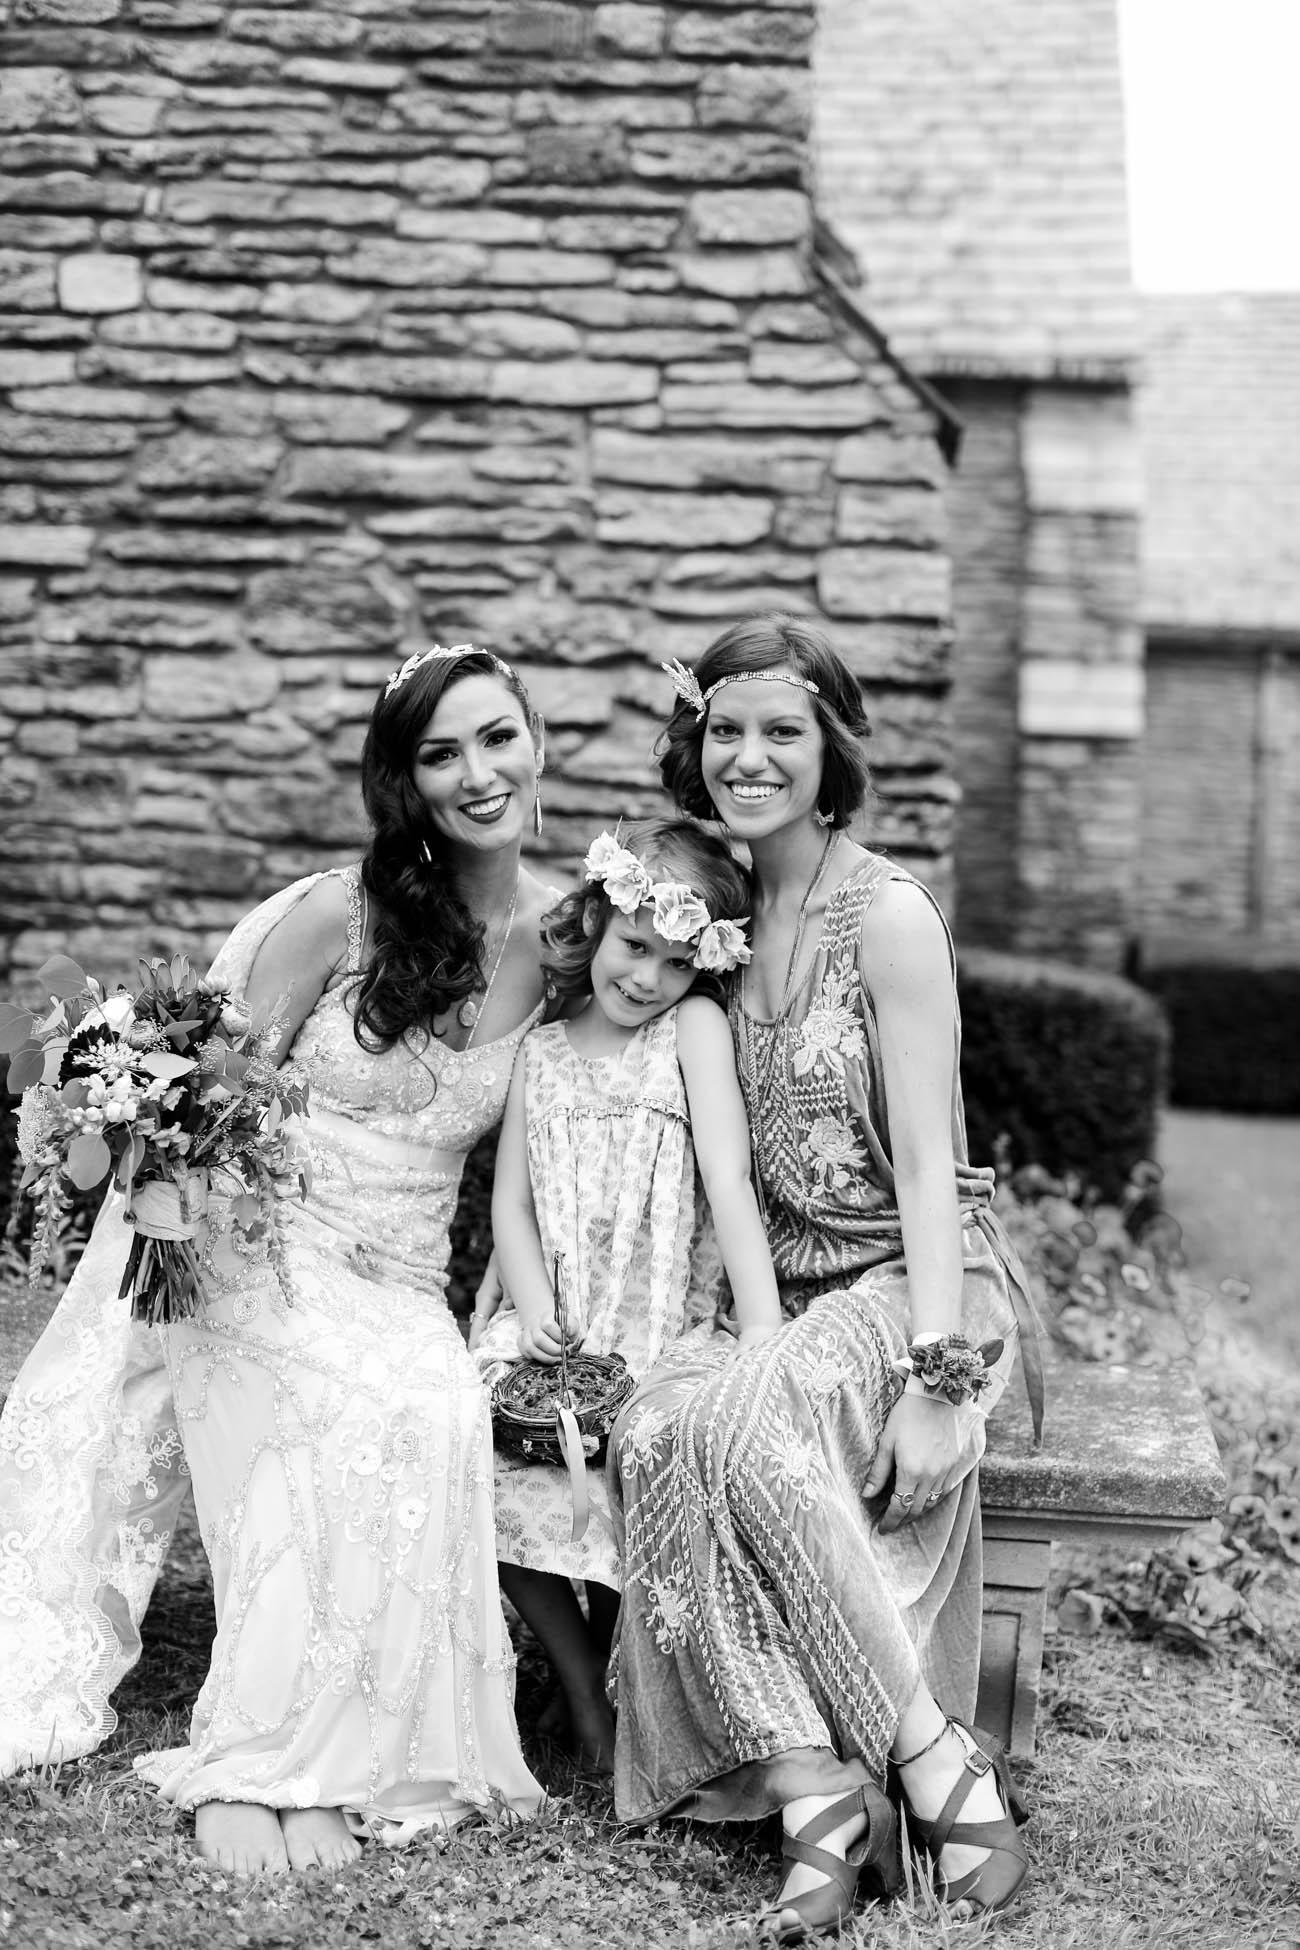 Speakeasy-1920s-theme-Louisville-and-Lexington Wedding-313.jpg